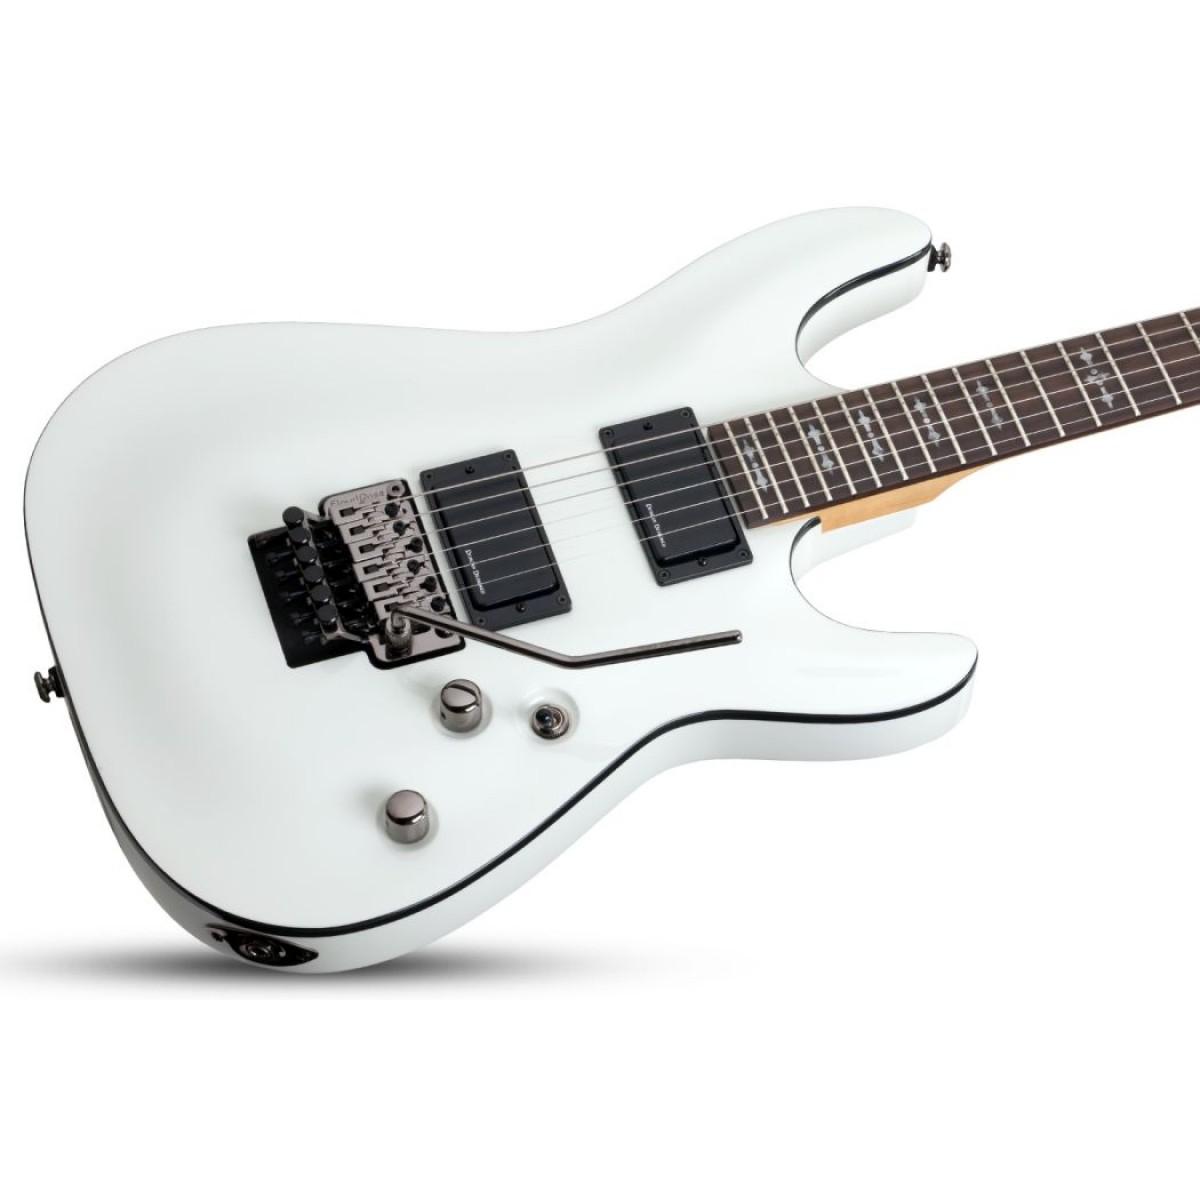 schecter sch3246 demon 6 fr vwht electric guitar. Black Bedroom Furniture Sets. Home Design Ideas